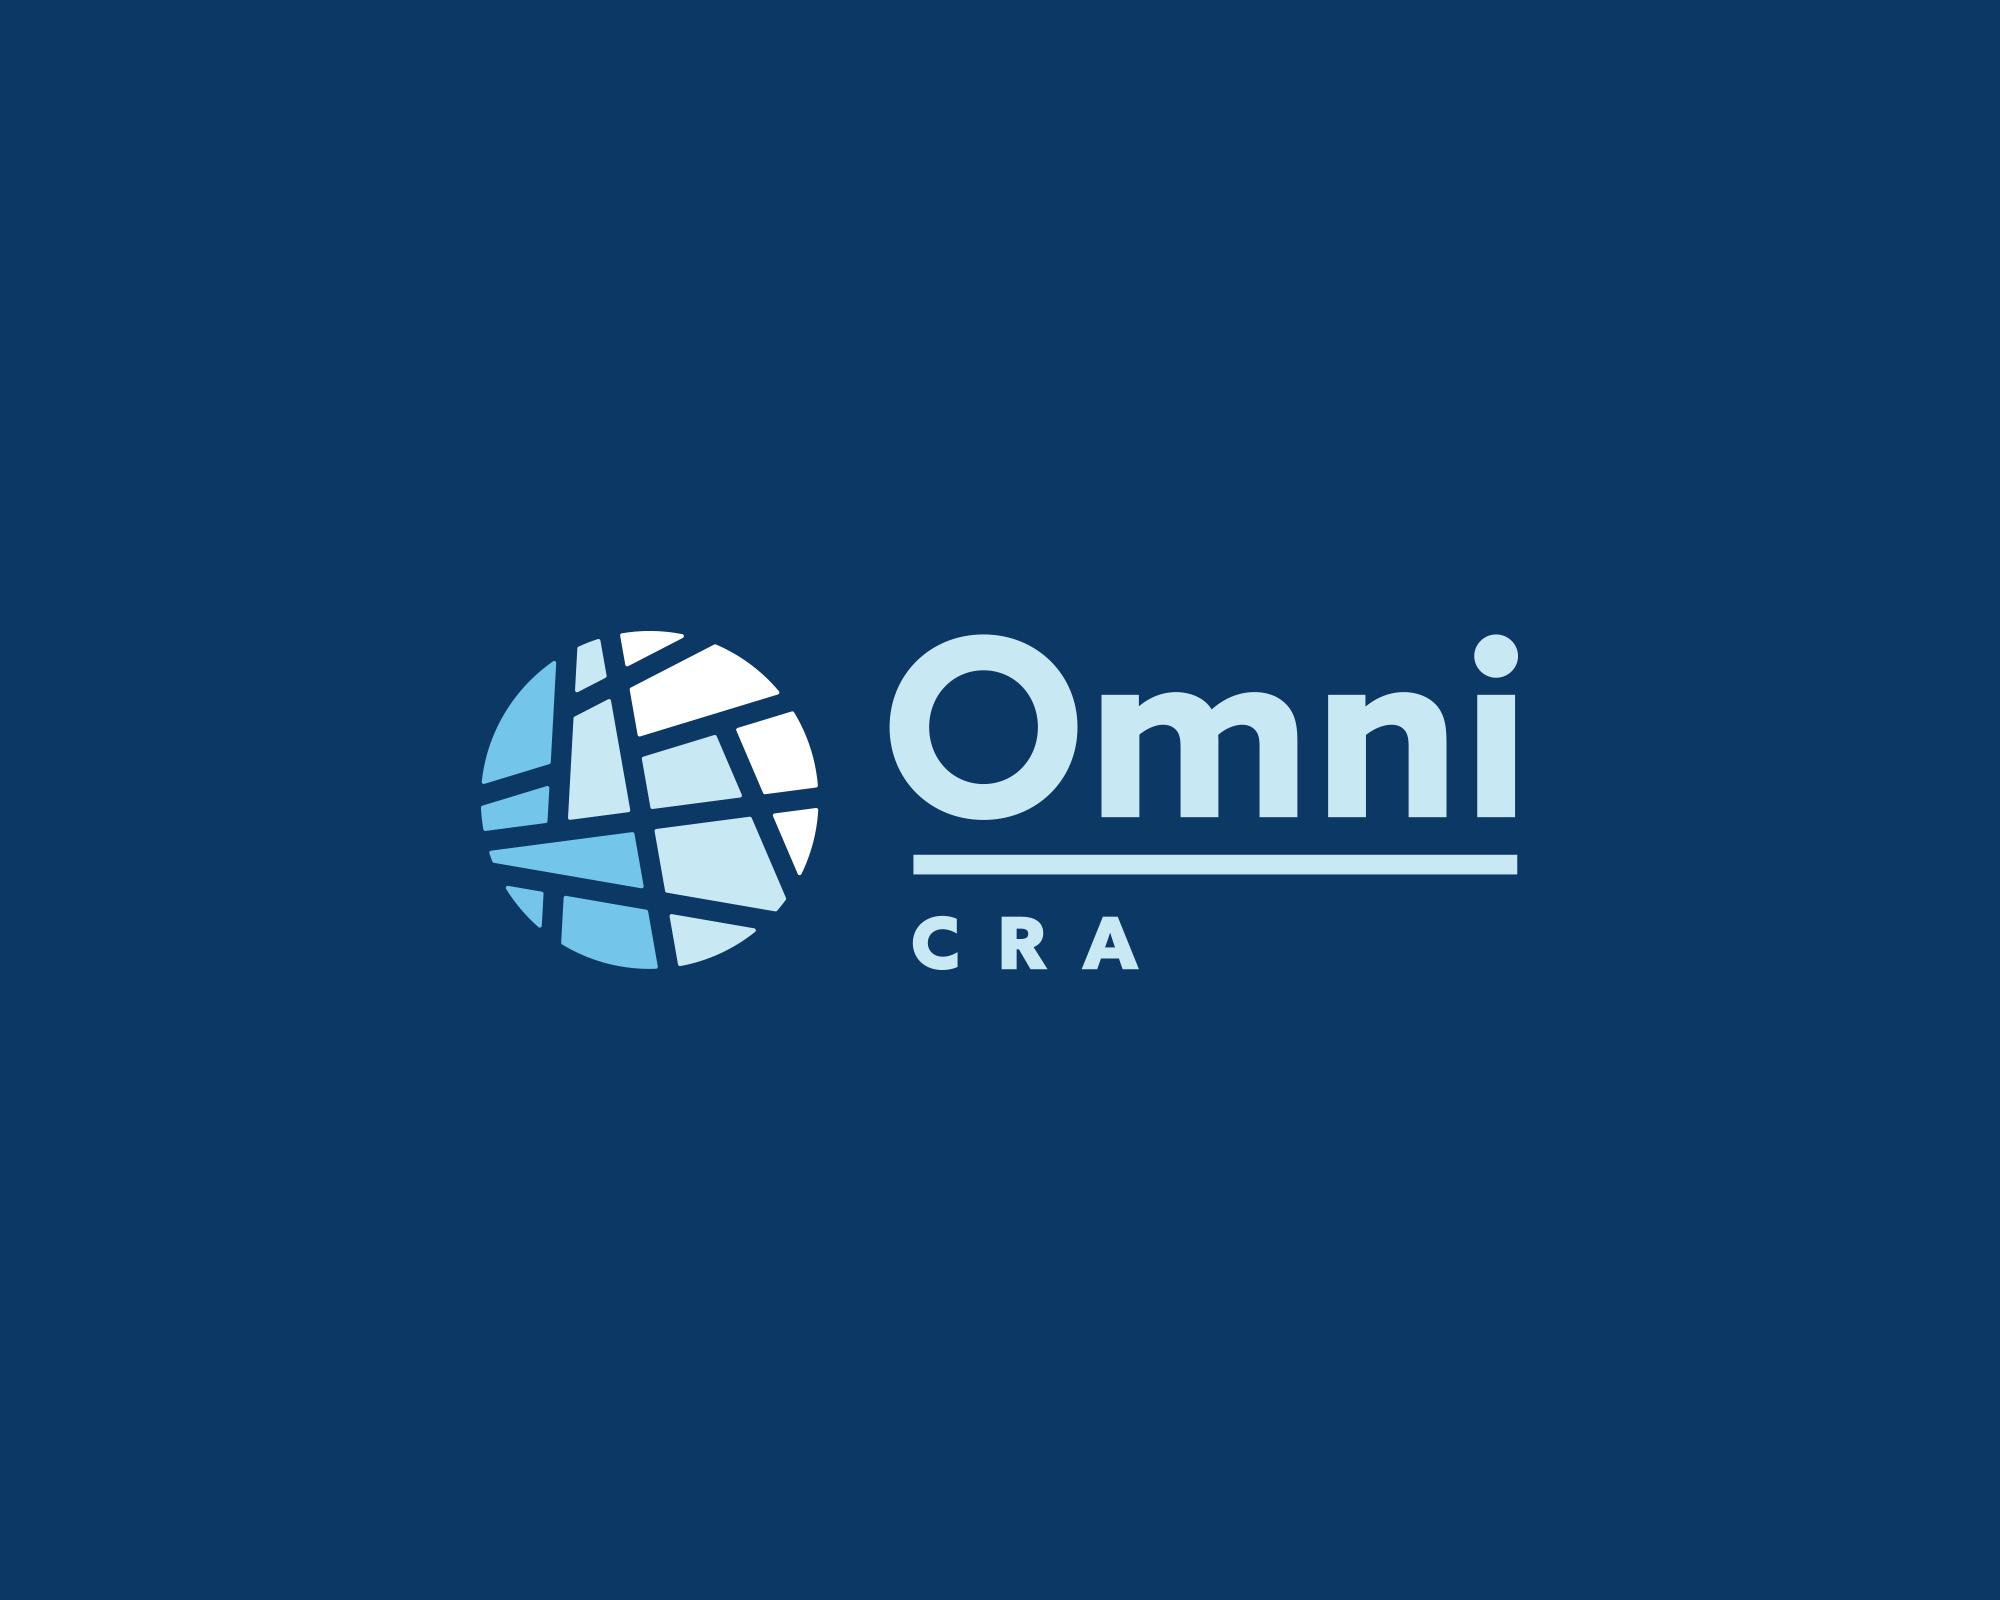 Omni CRA horizontal logo on dark background